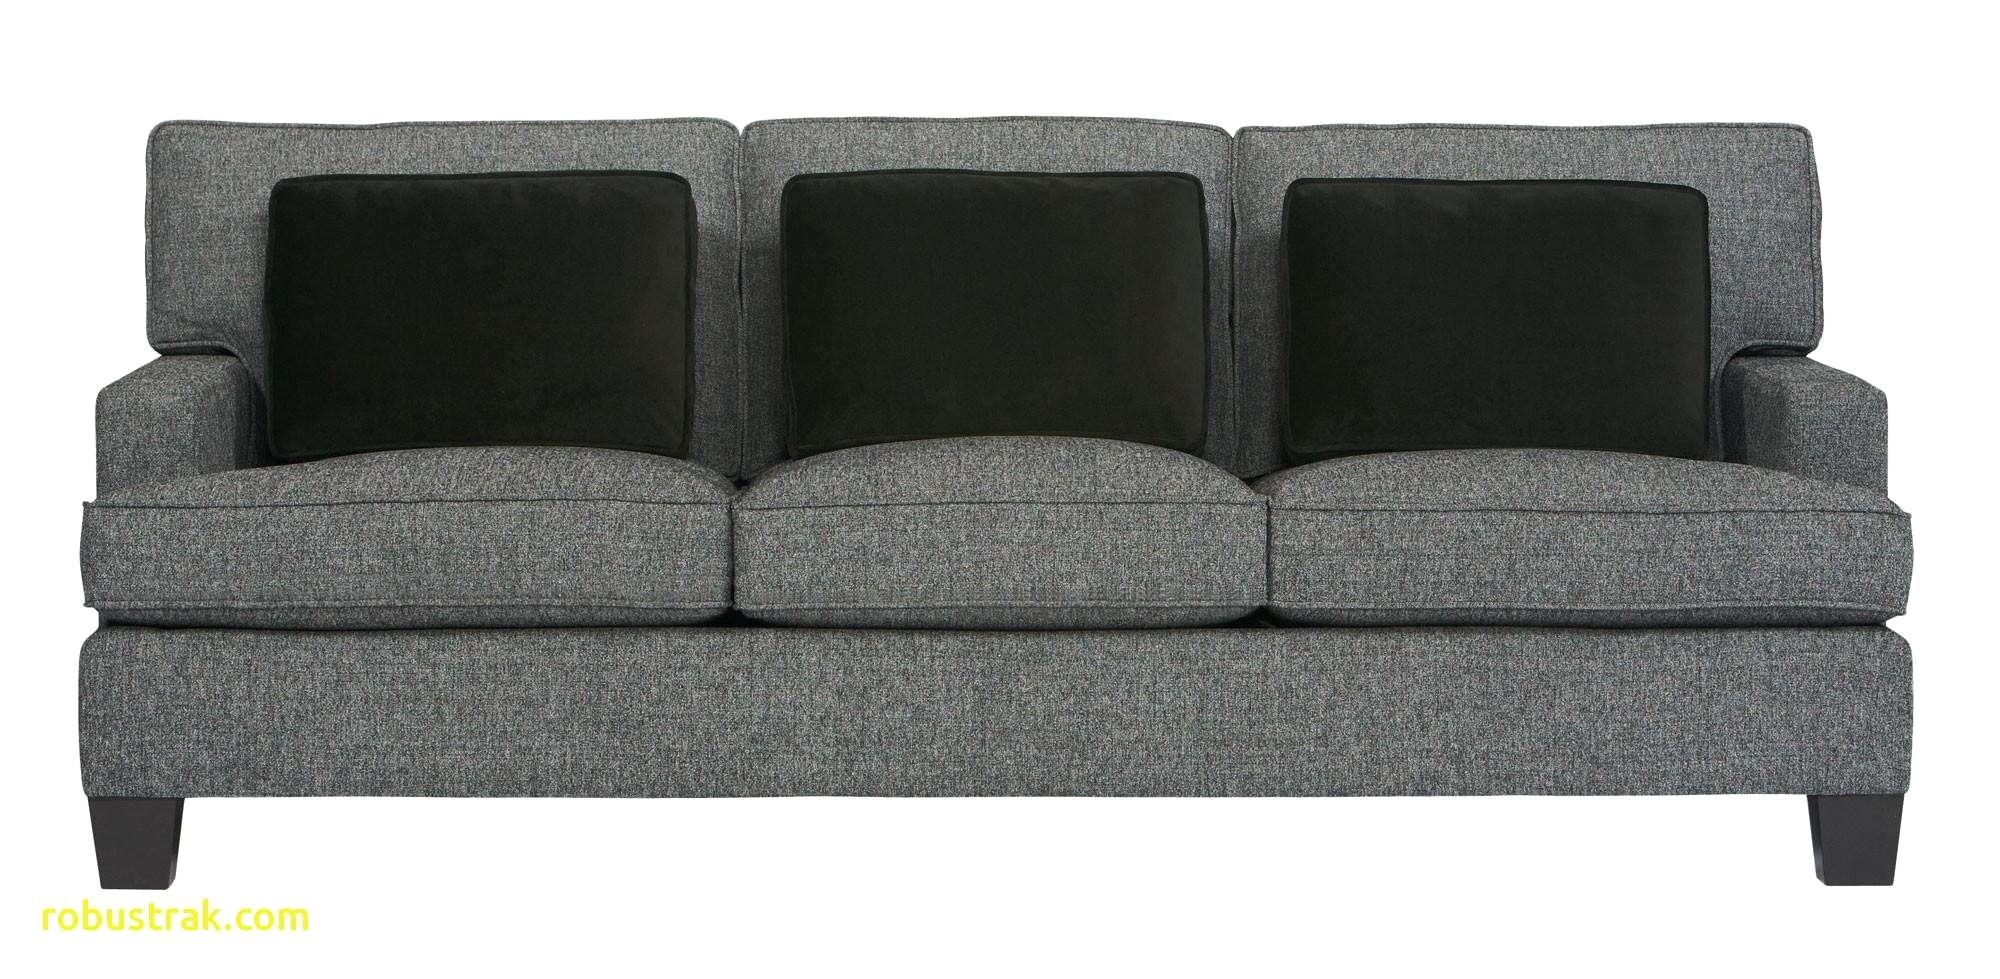 Macy S Brown Leather Chair 50 Beautiful Macys Furniture Sleeper sofa Pics 50 Photos Home